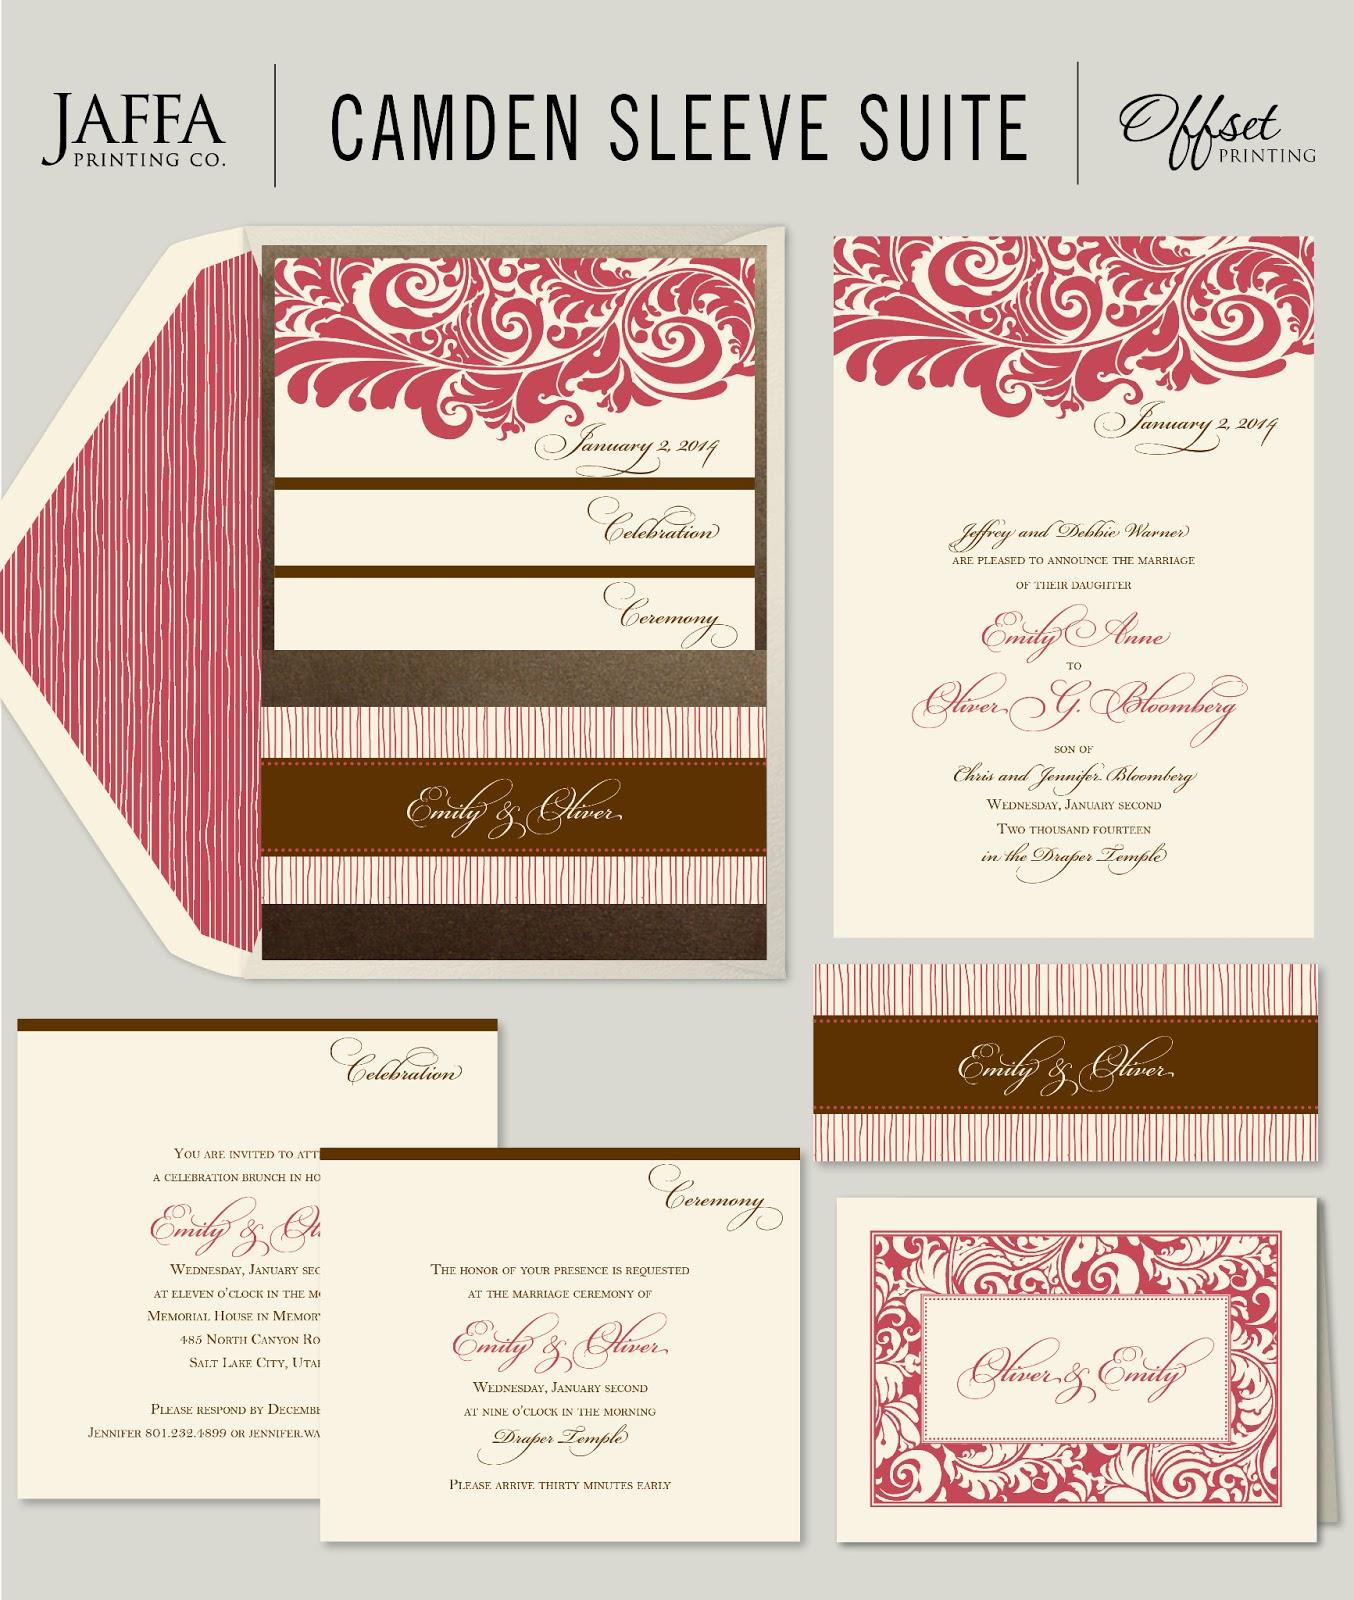 Wedding Invitation Blog: Gorgeous Pocket Wedding